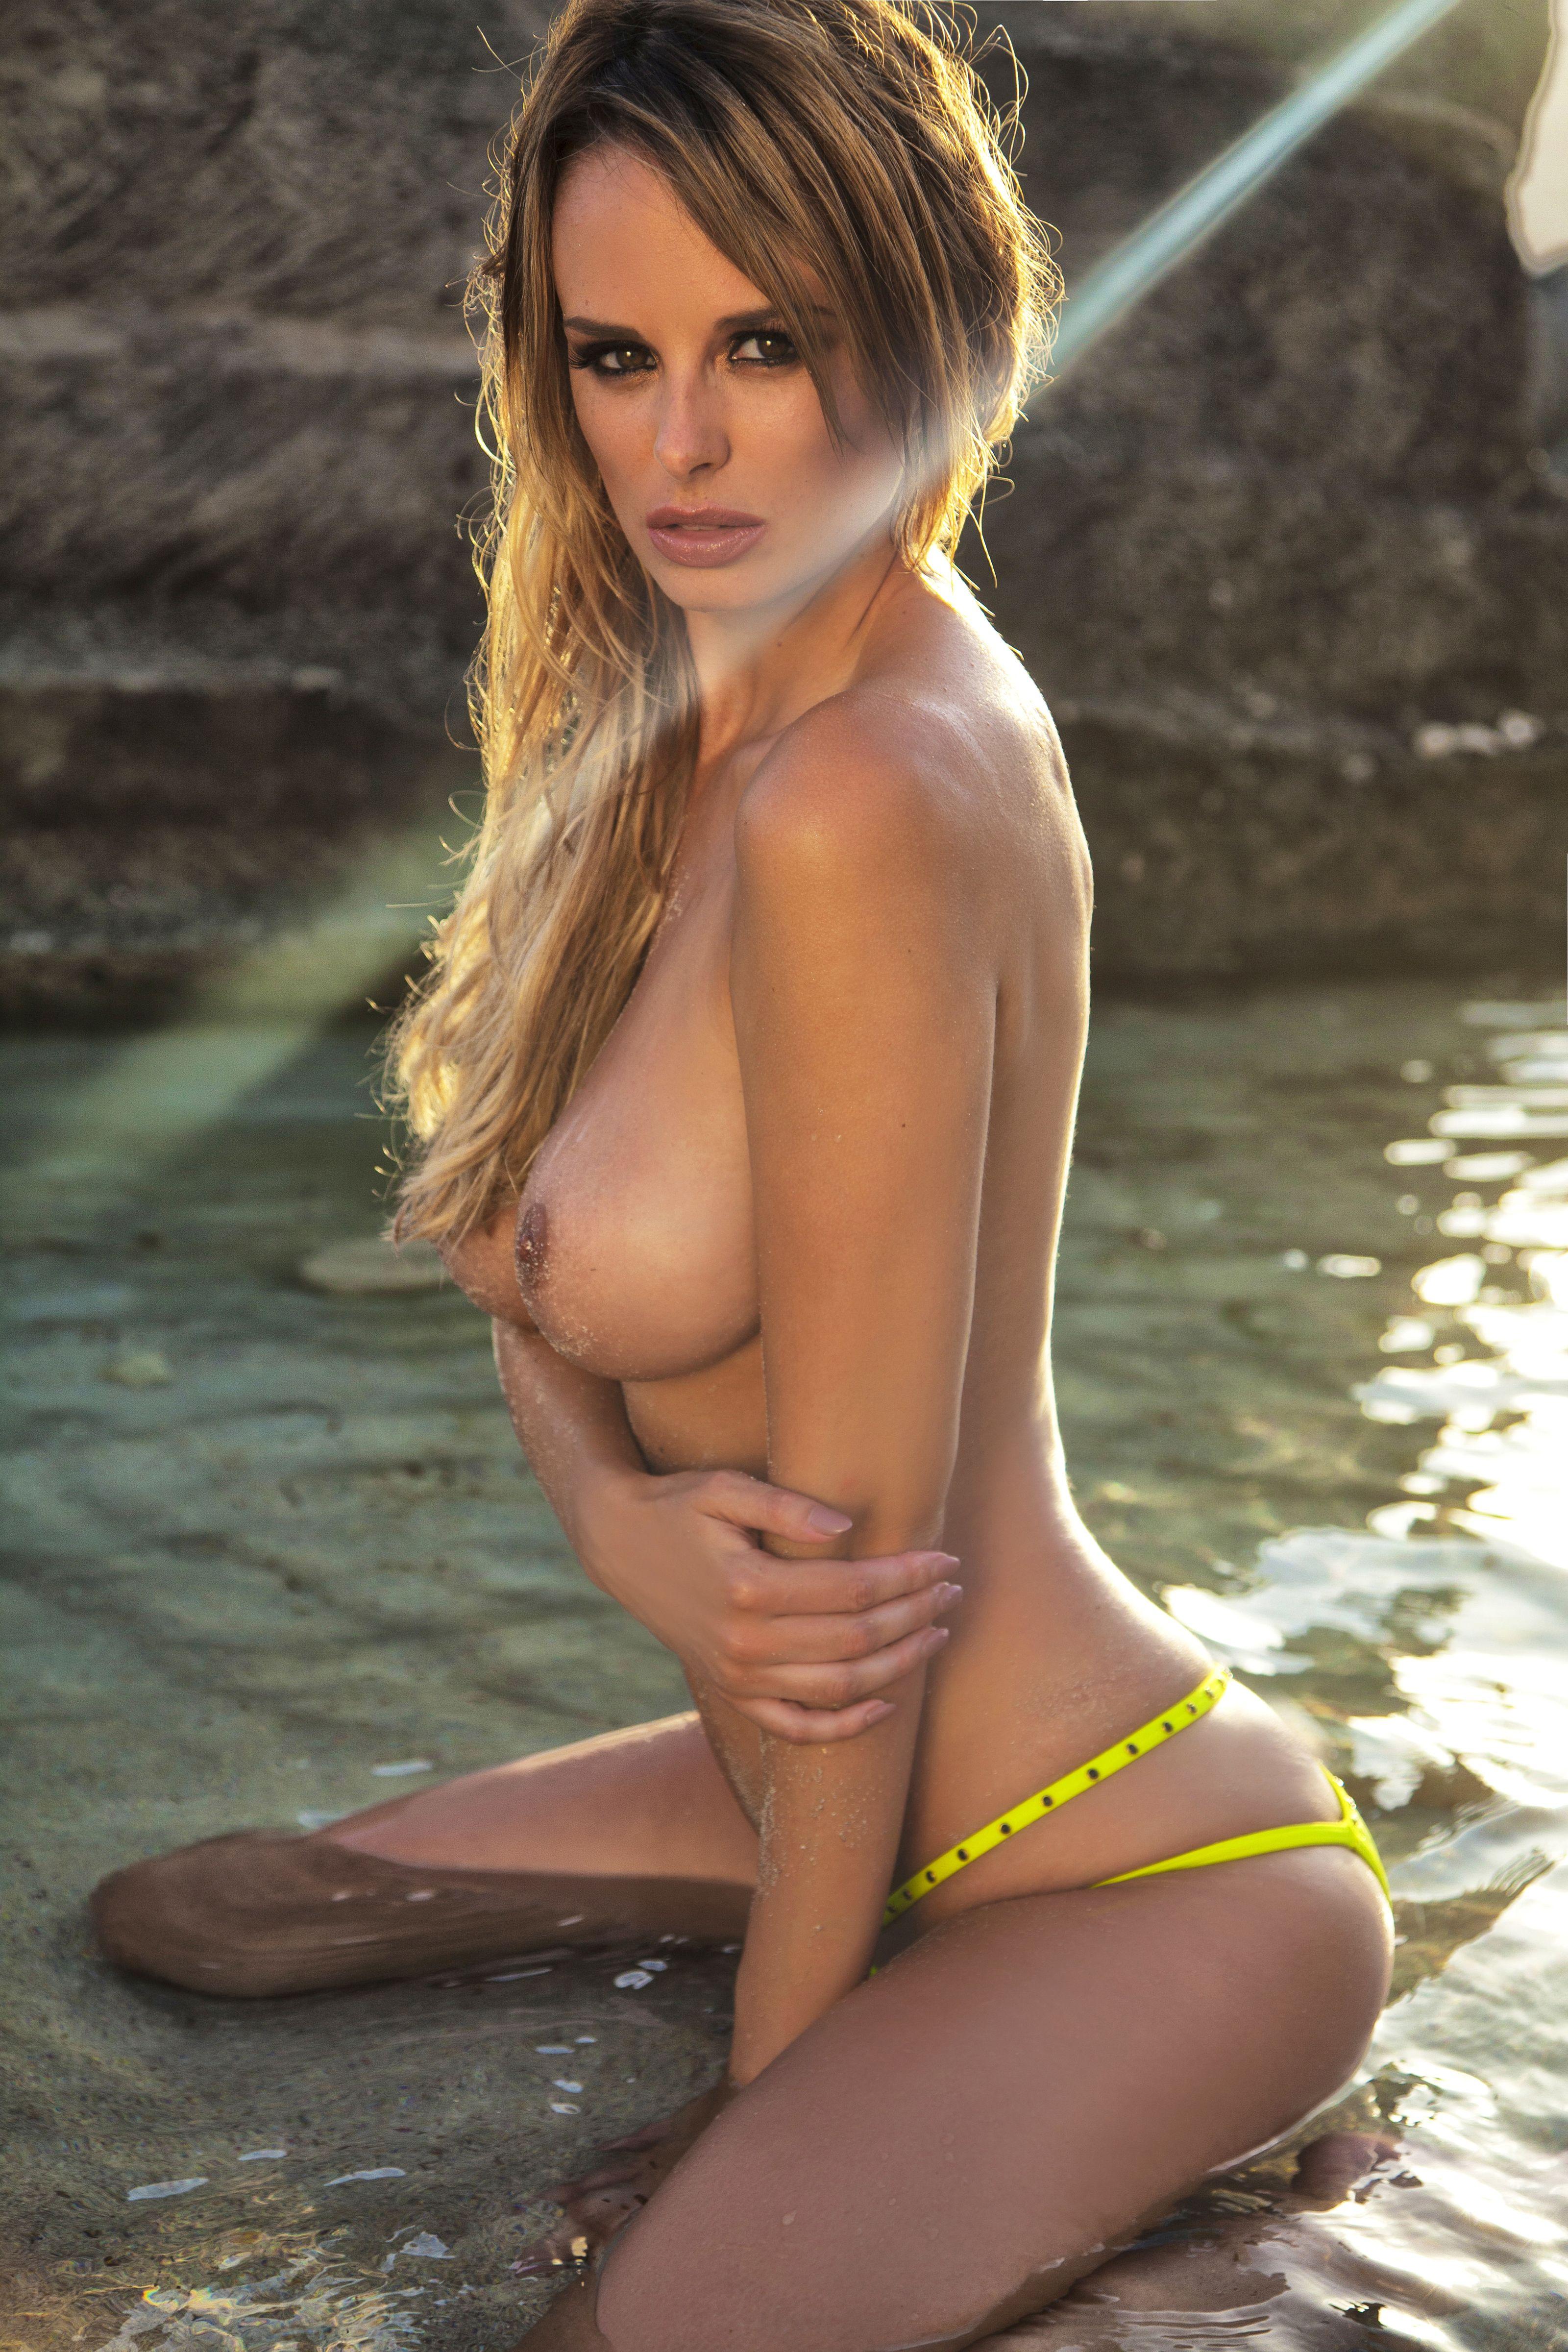 Rhian Sugden Topless Phot...